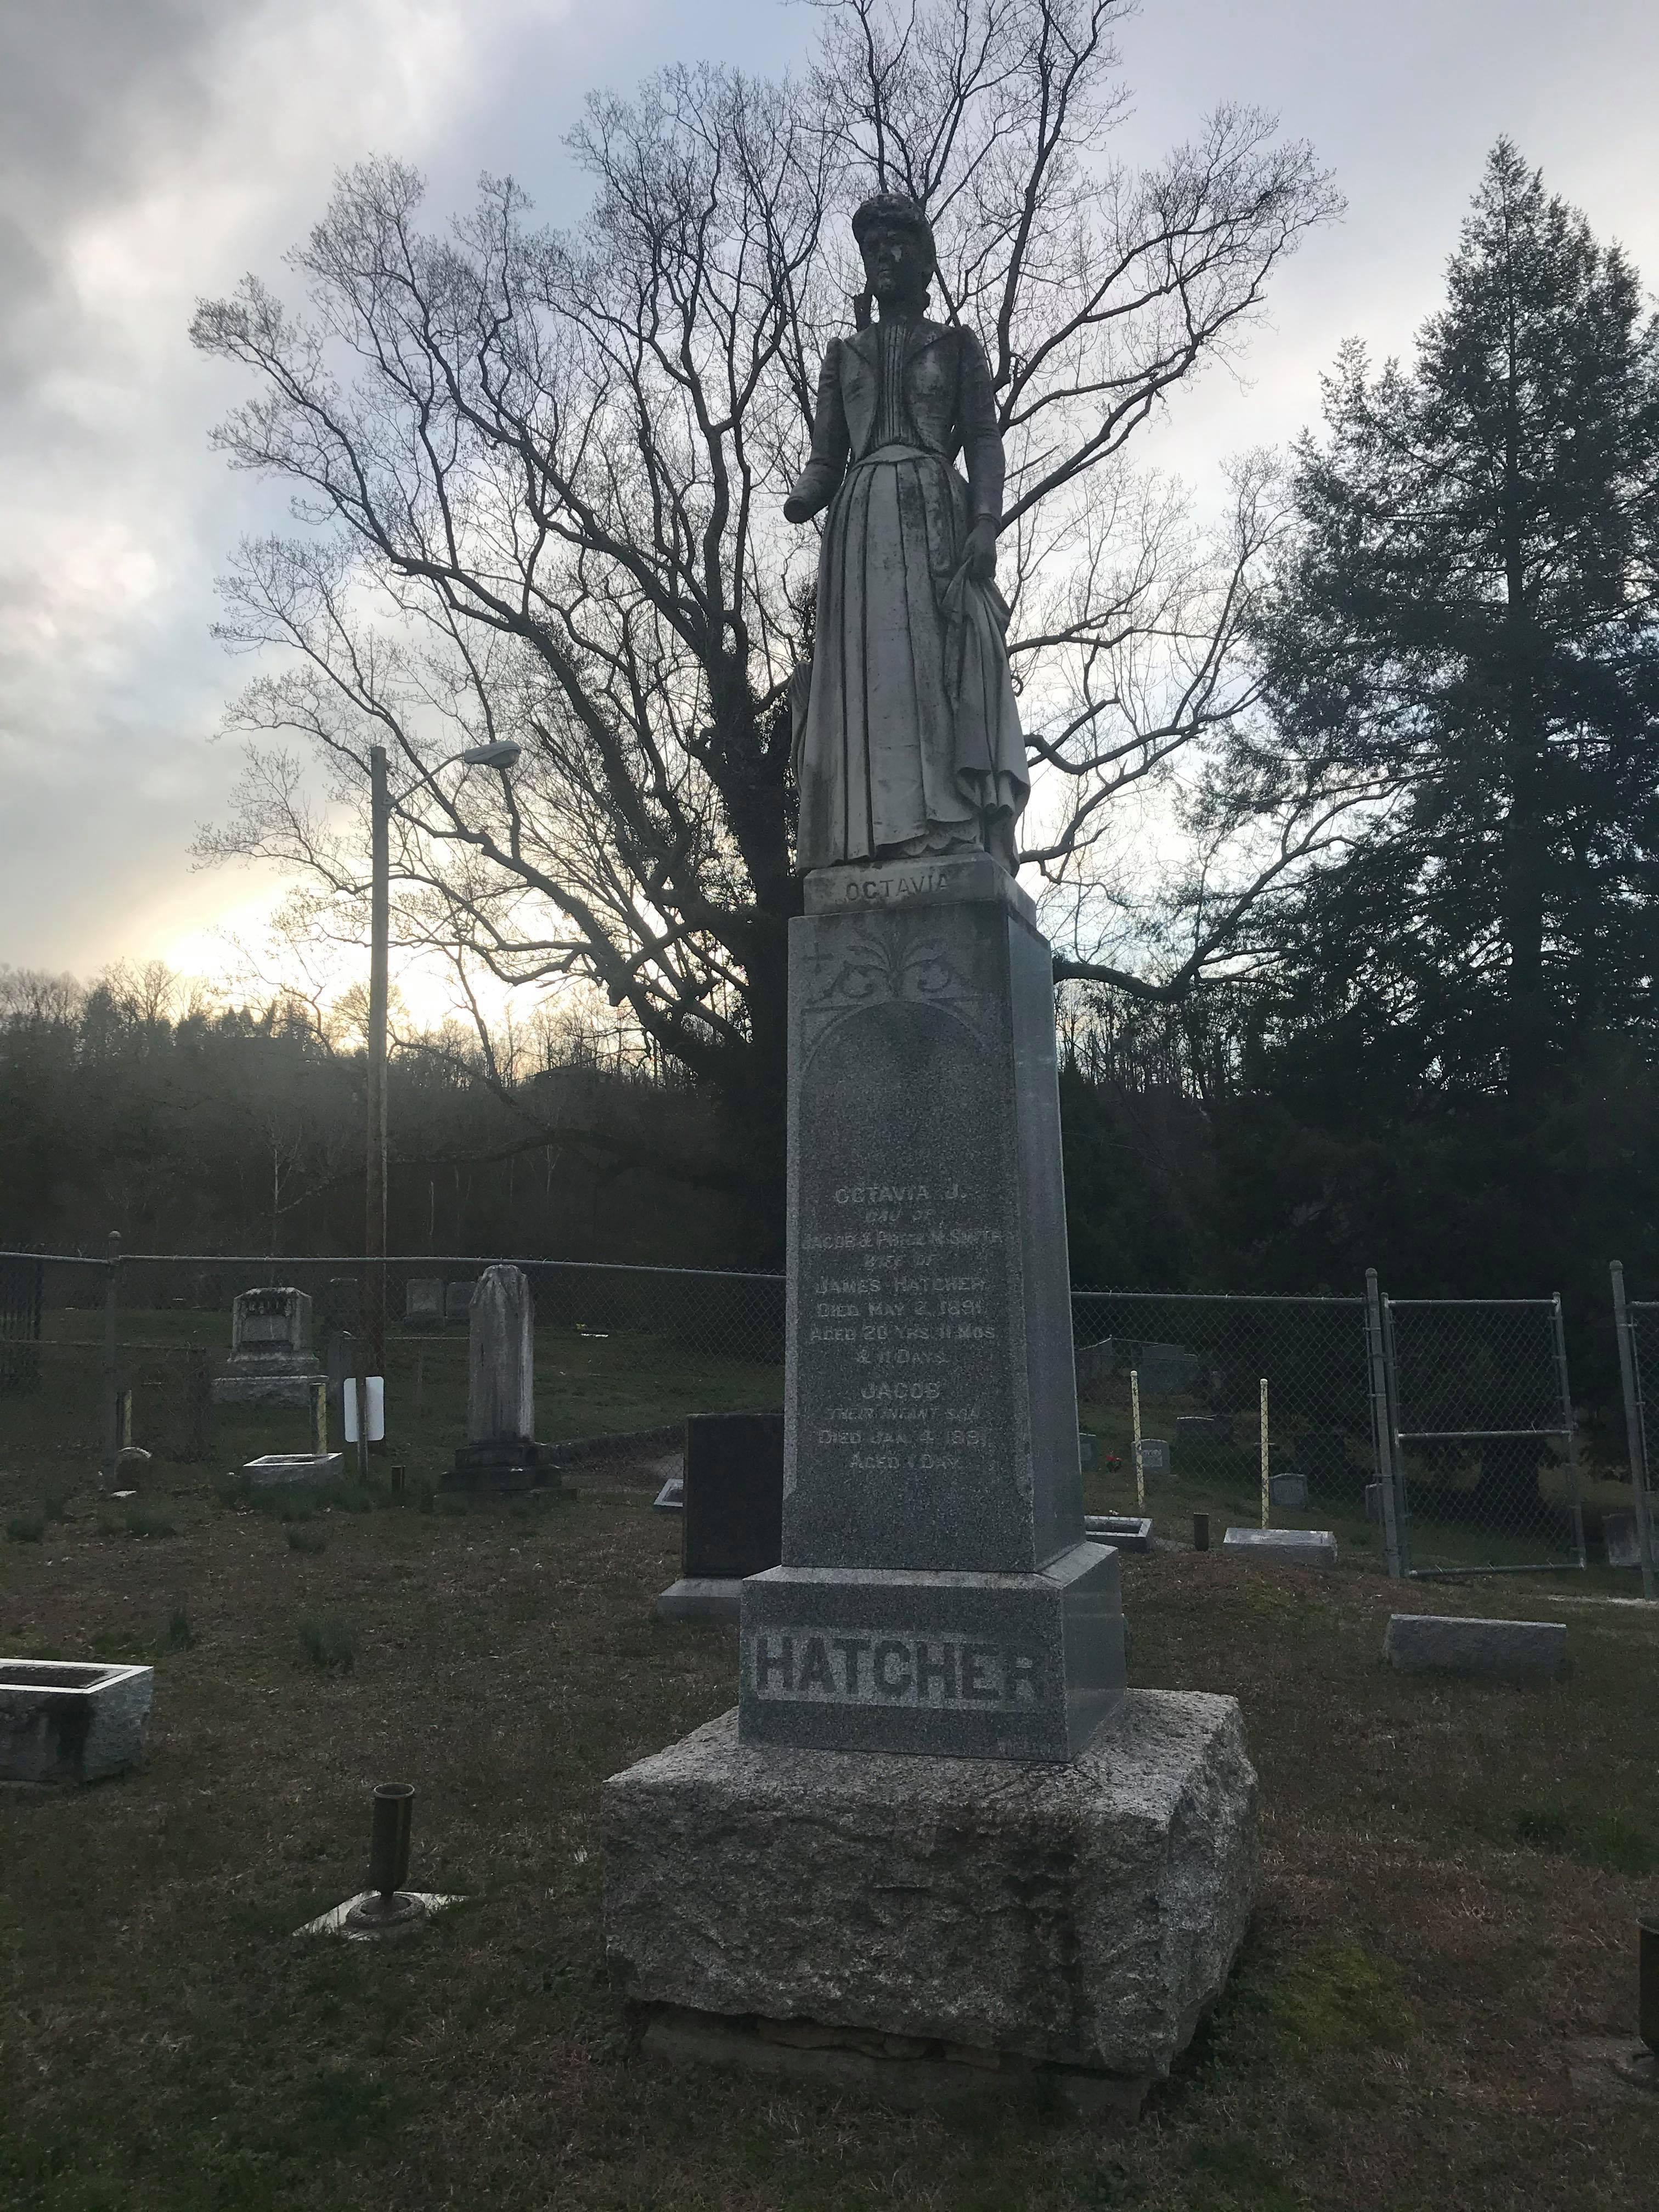 Octavia Hatcher's Headstone